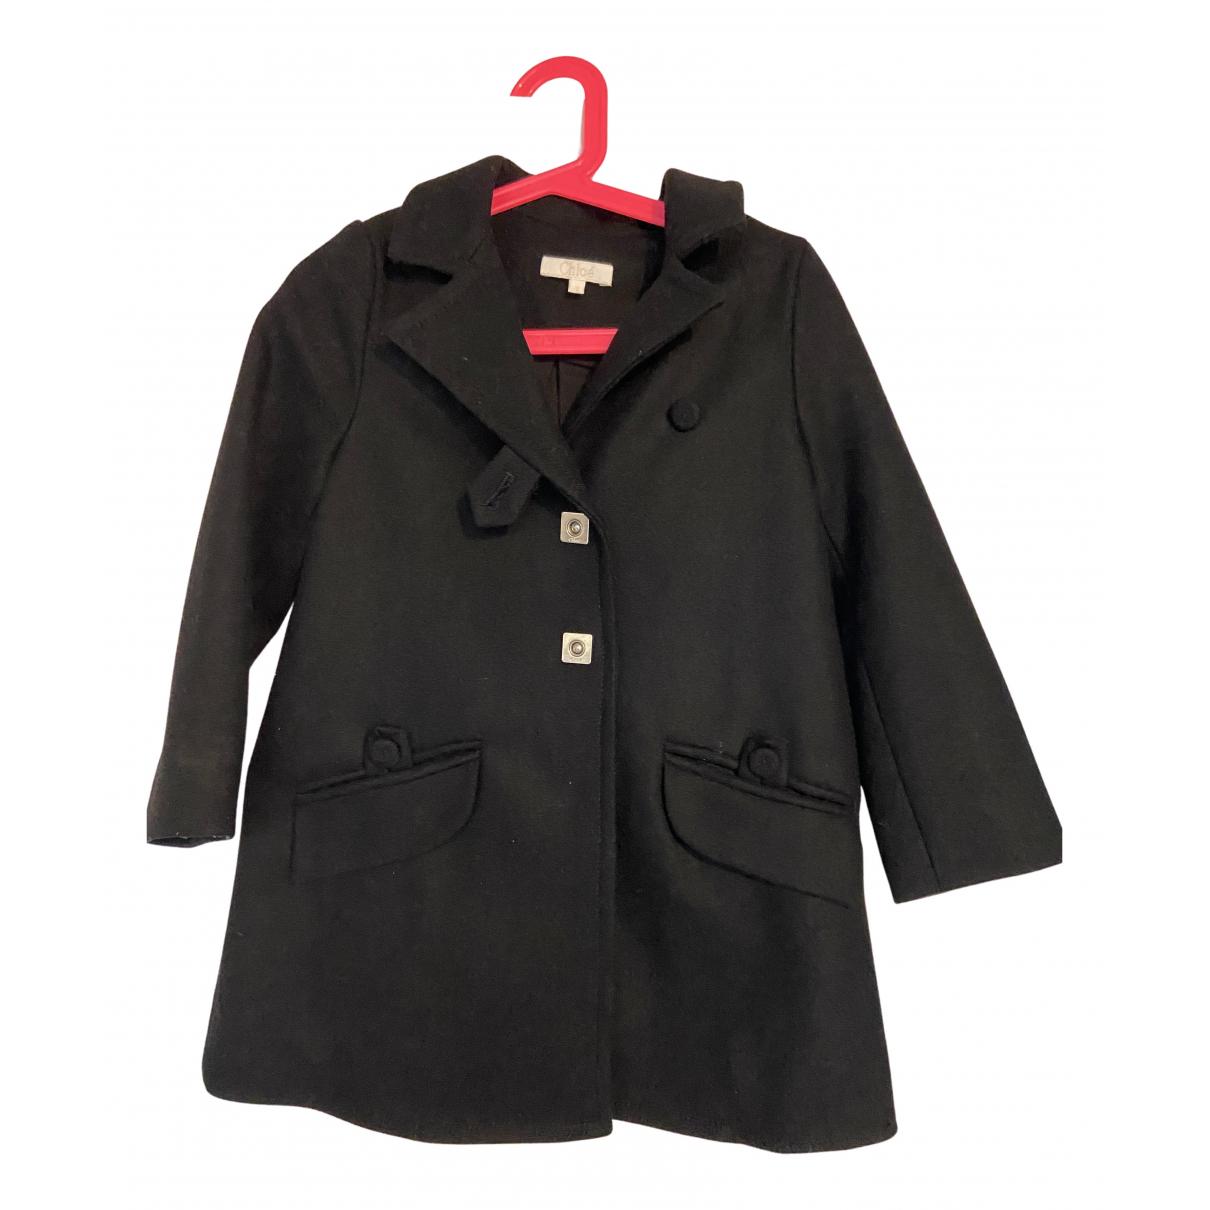 Chloé N Black Wool jacket & coat for Kids 4 years - up to 102cm FR